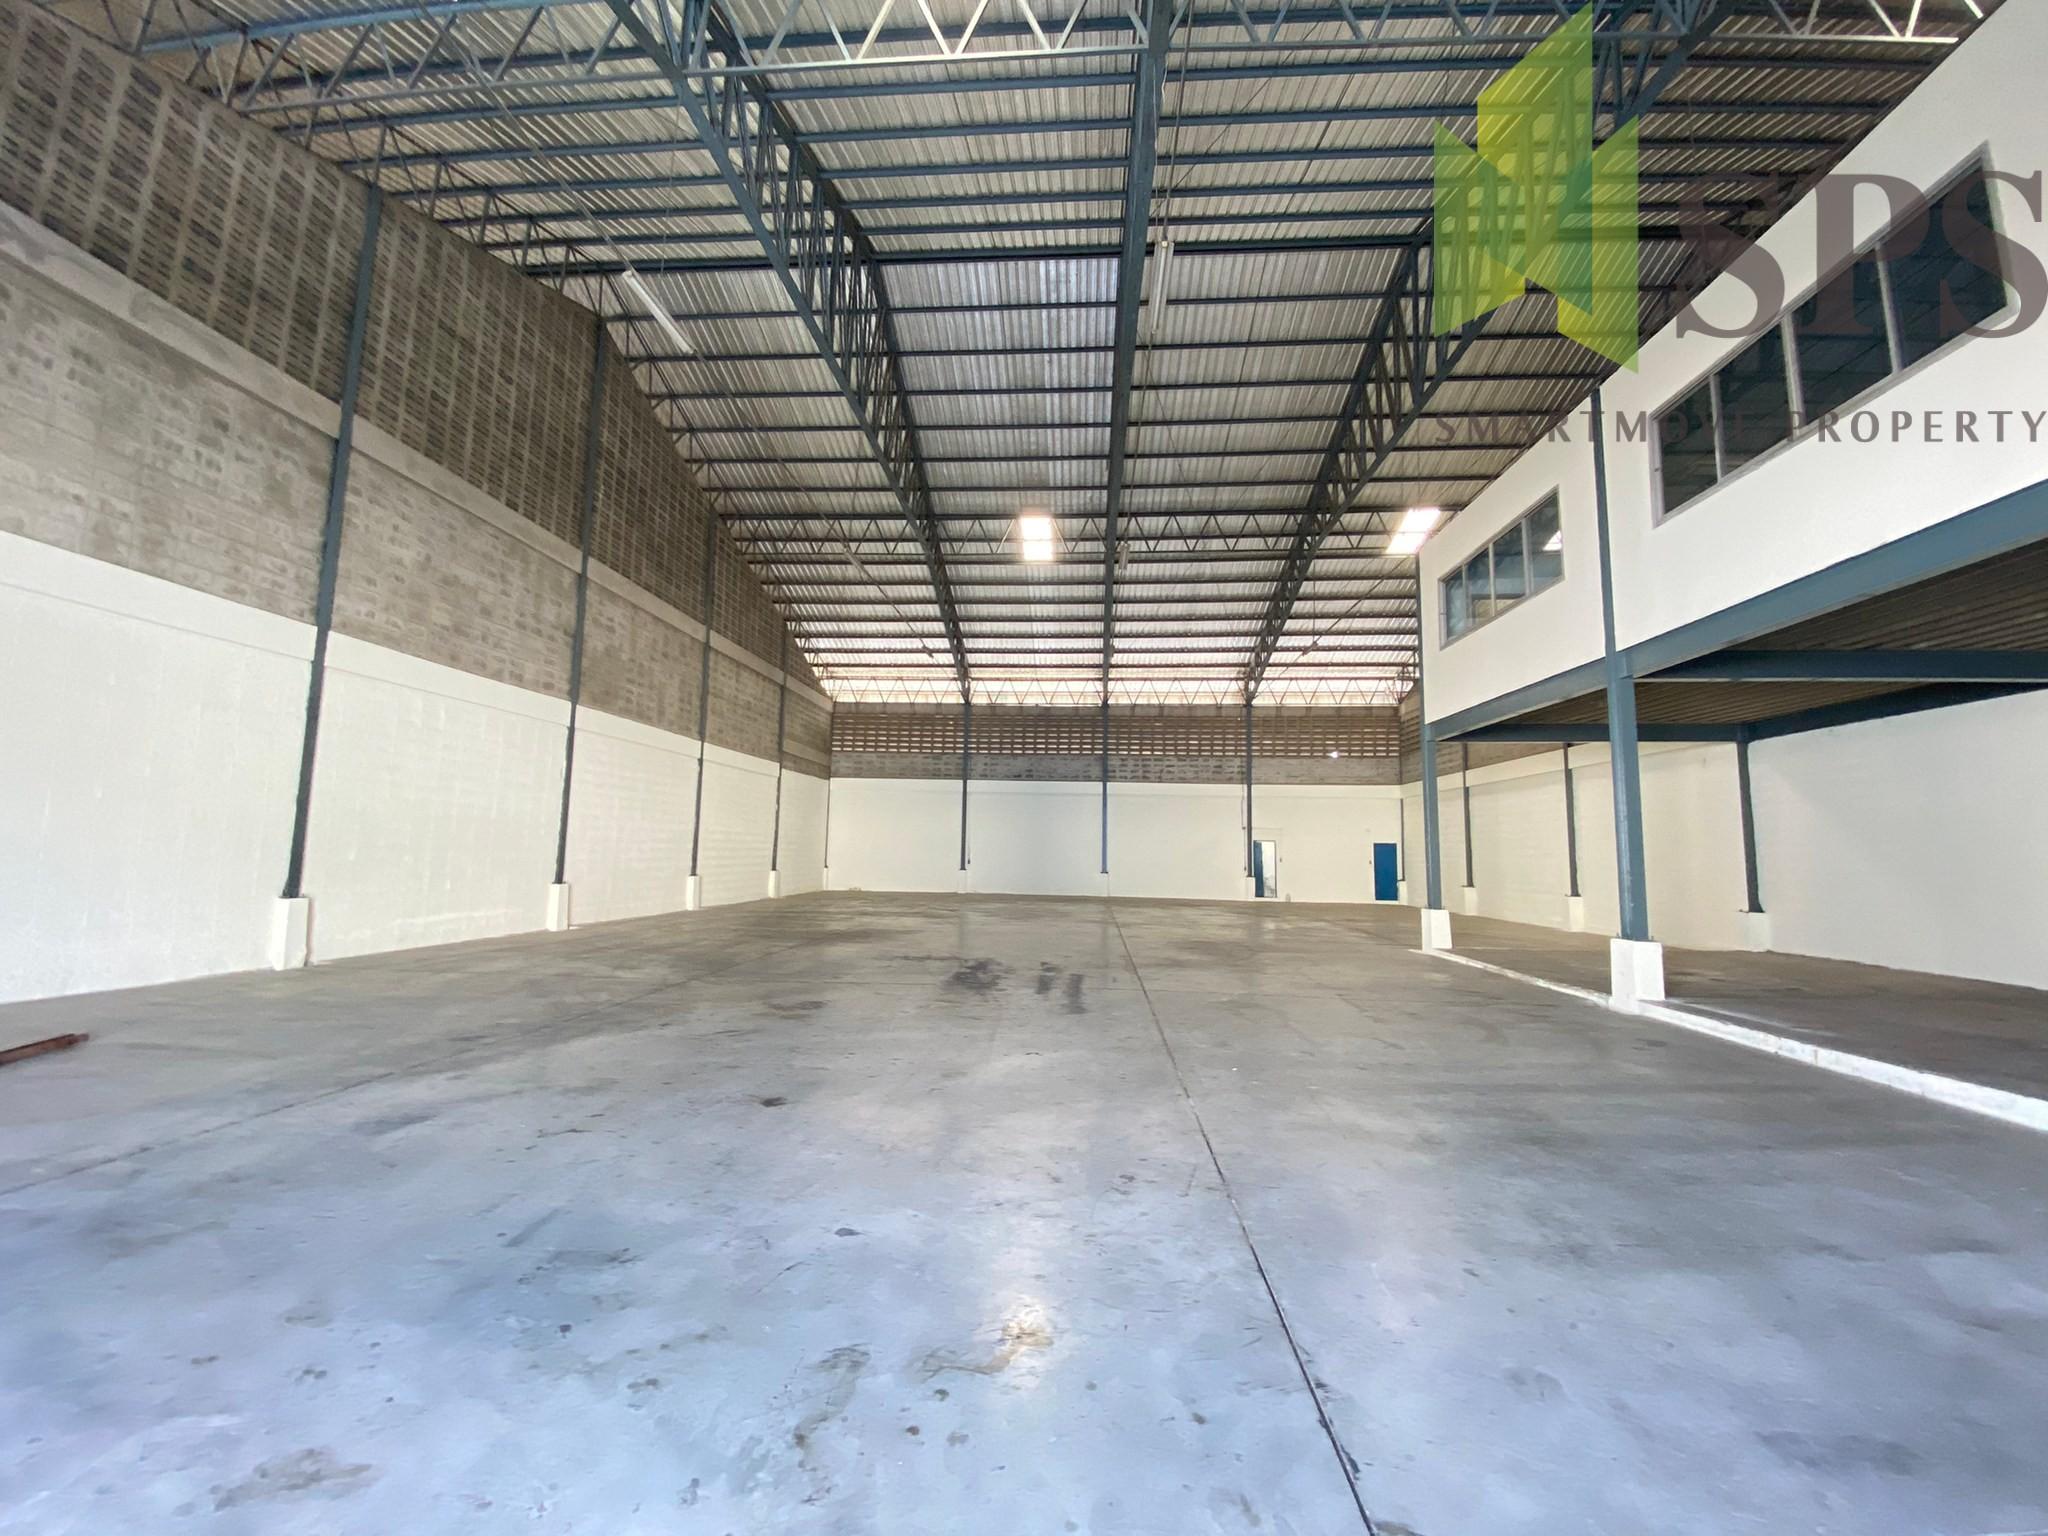 Factory, Warehouse for RENT at King Kaew Road, Bang Phli, Samut Prakan / โกดัง, โรงงาน สำหรับเช่า ที่ ถนน กิ่งแก้ว ราชาเทวะ บางพลี สมุทรปราการ (Property ID: SPS-PPW153)